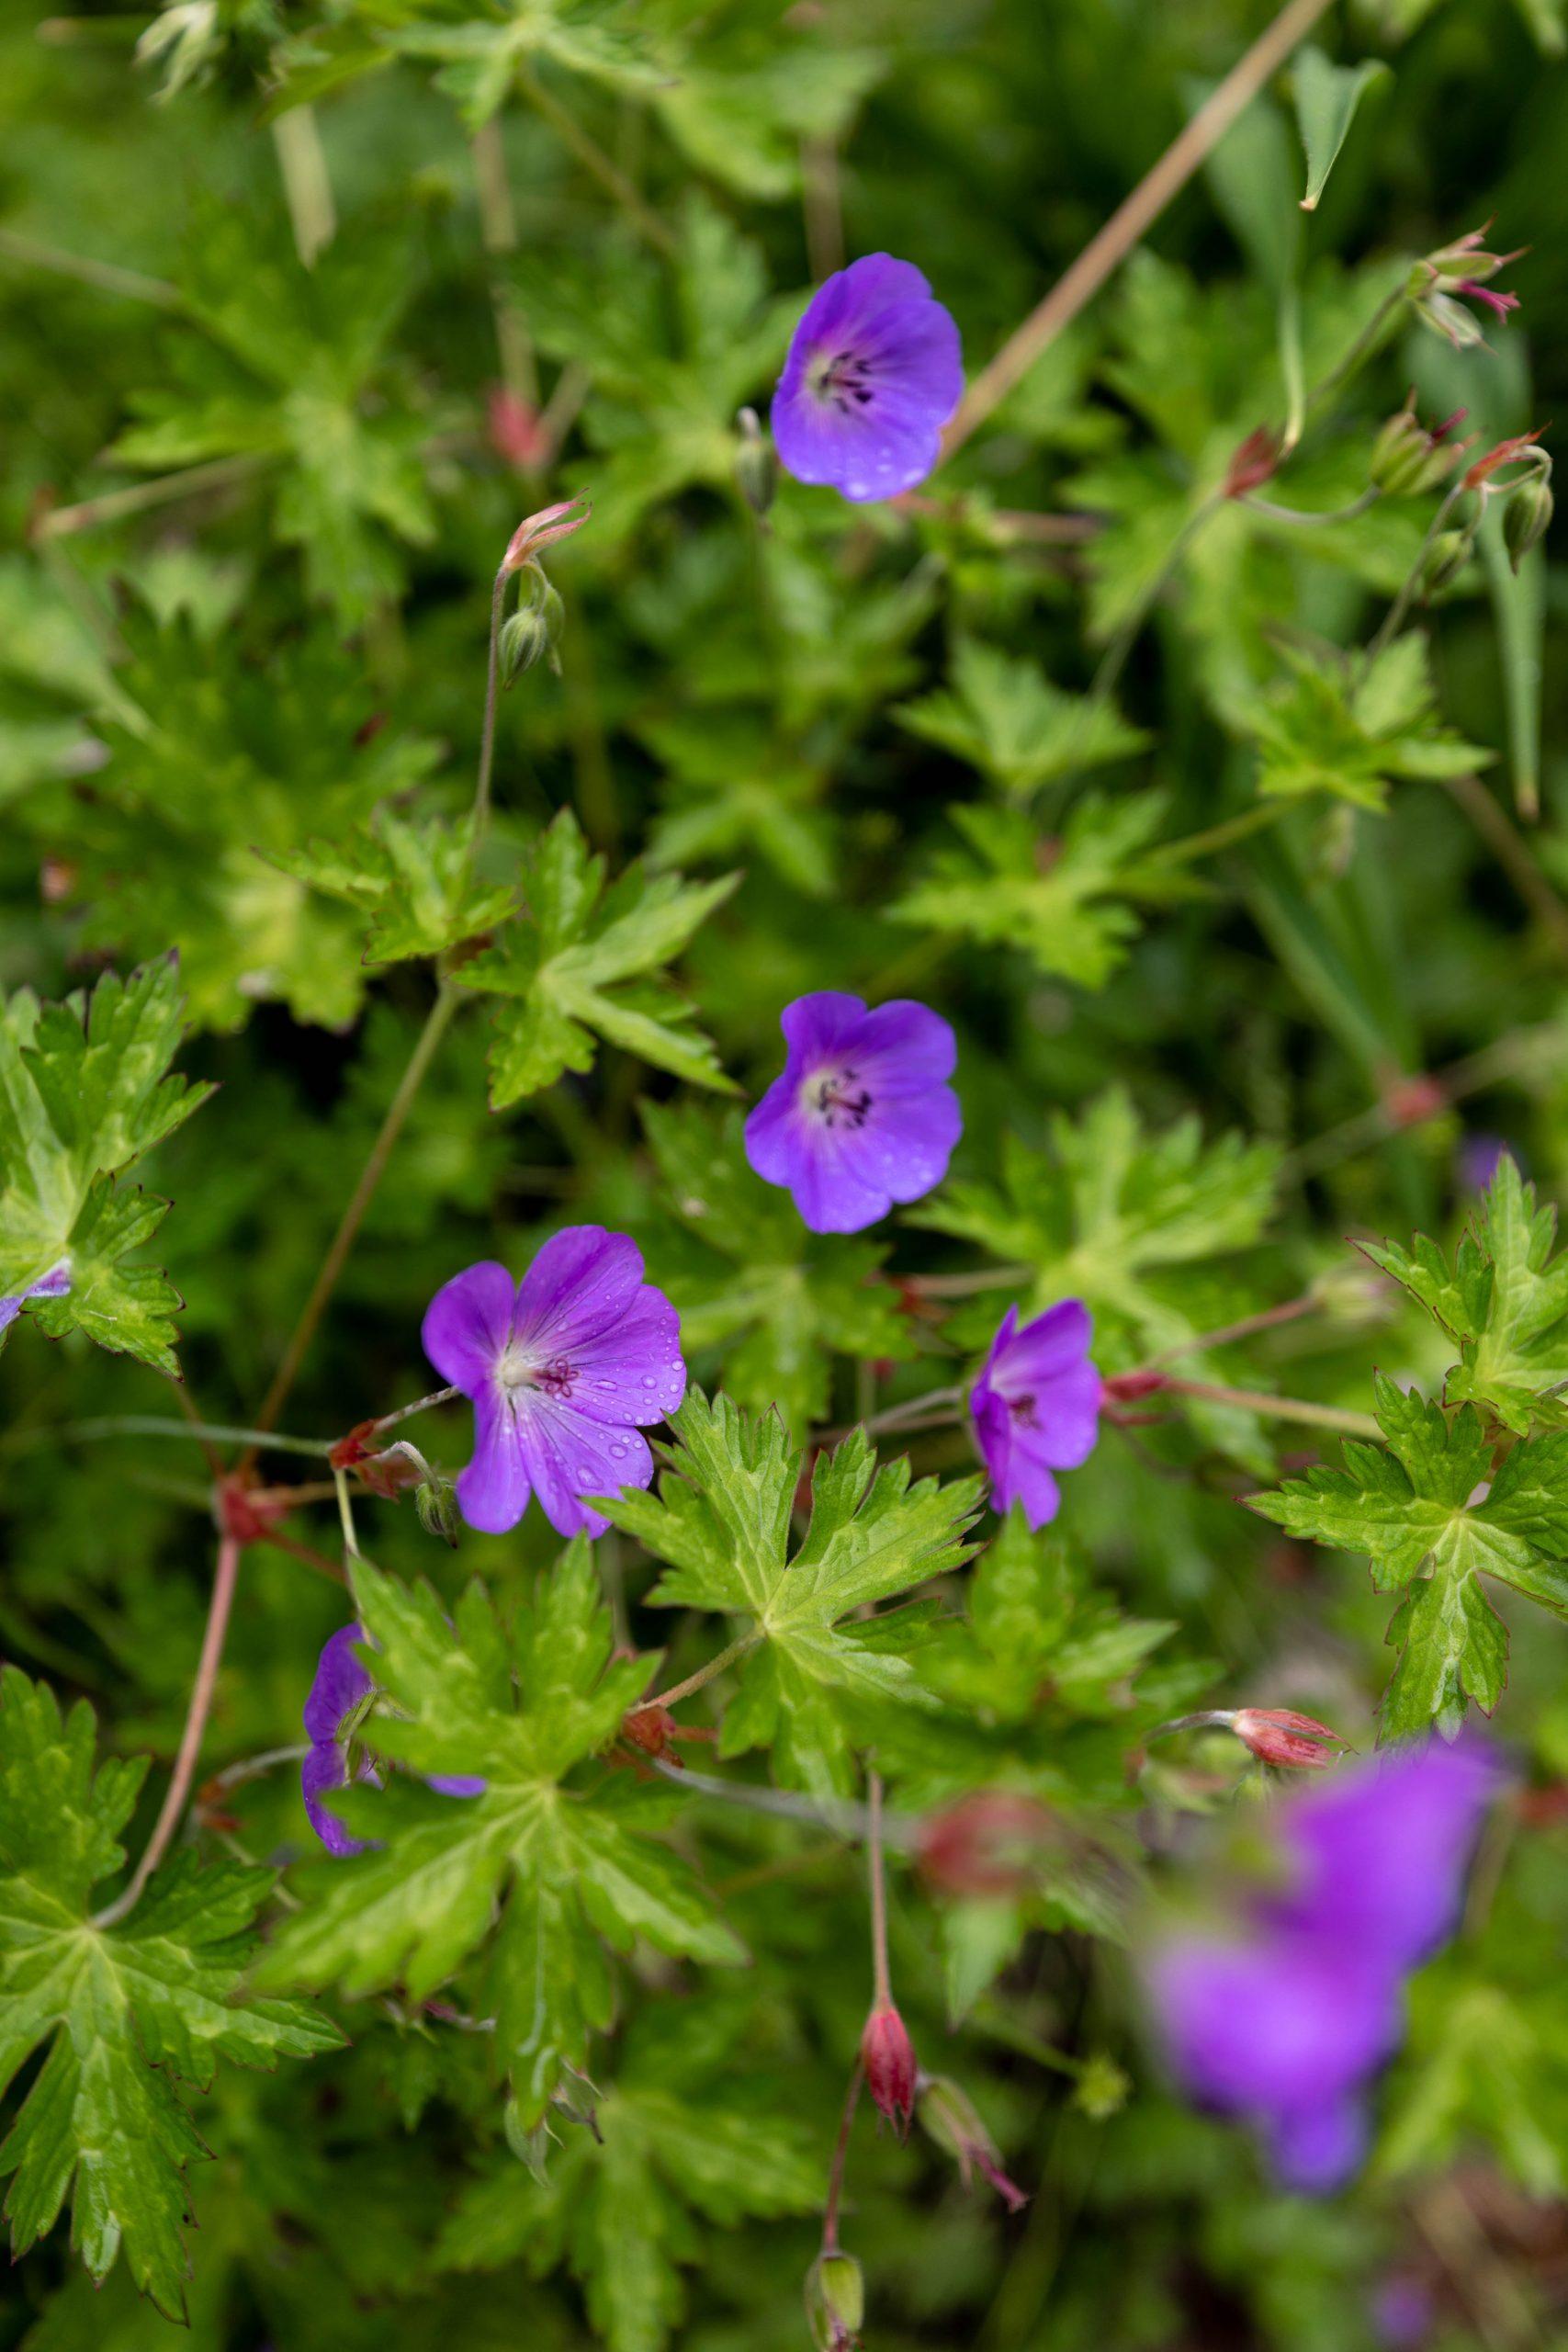 Purple Flowers at Mission Point Resort on Mackinac Island by @AnnieFairfax